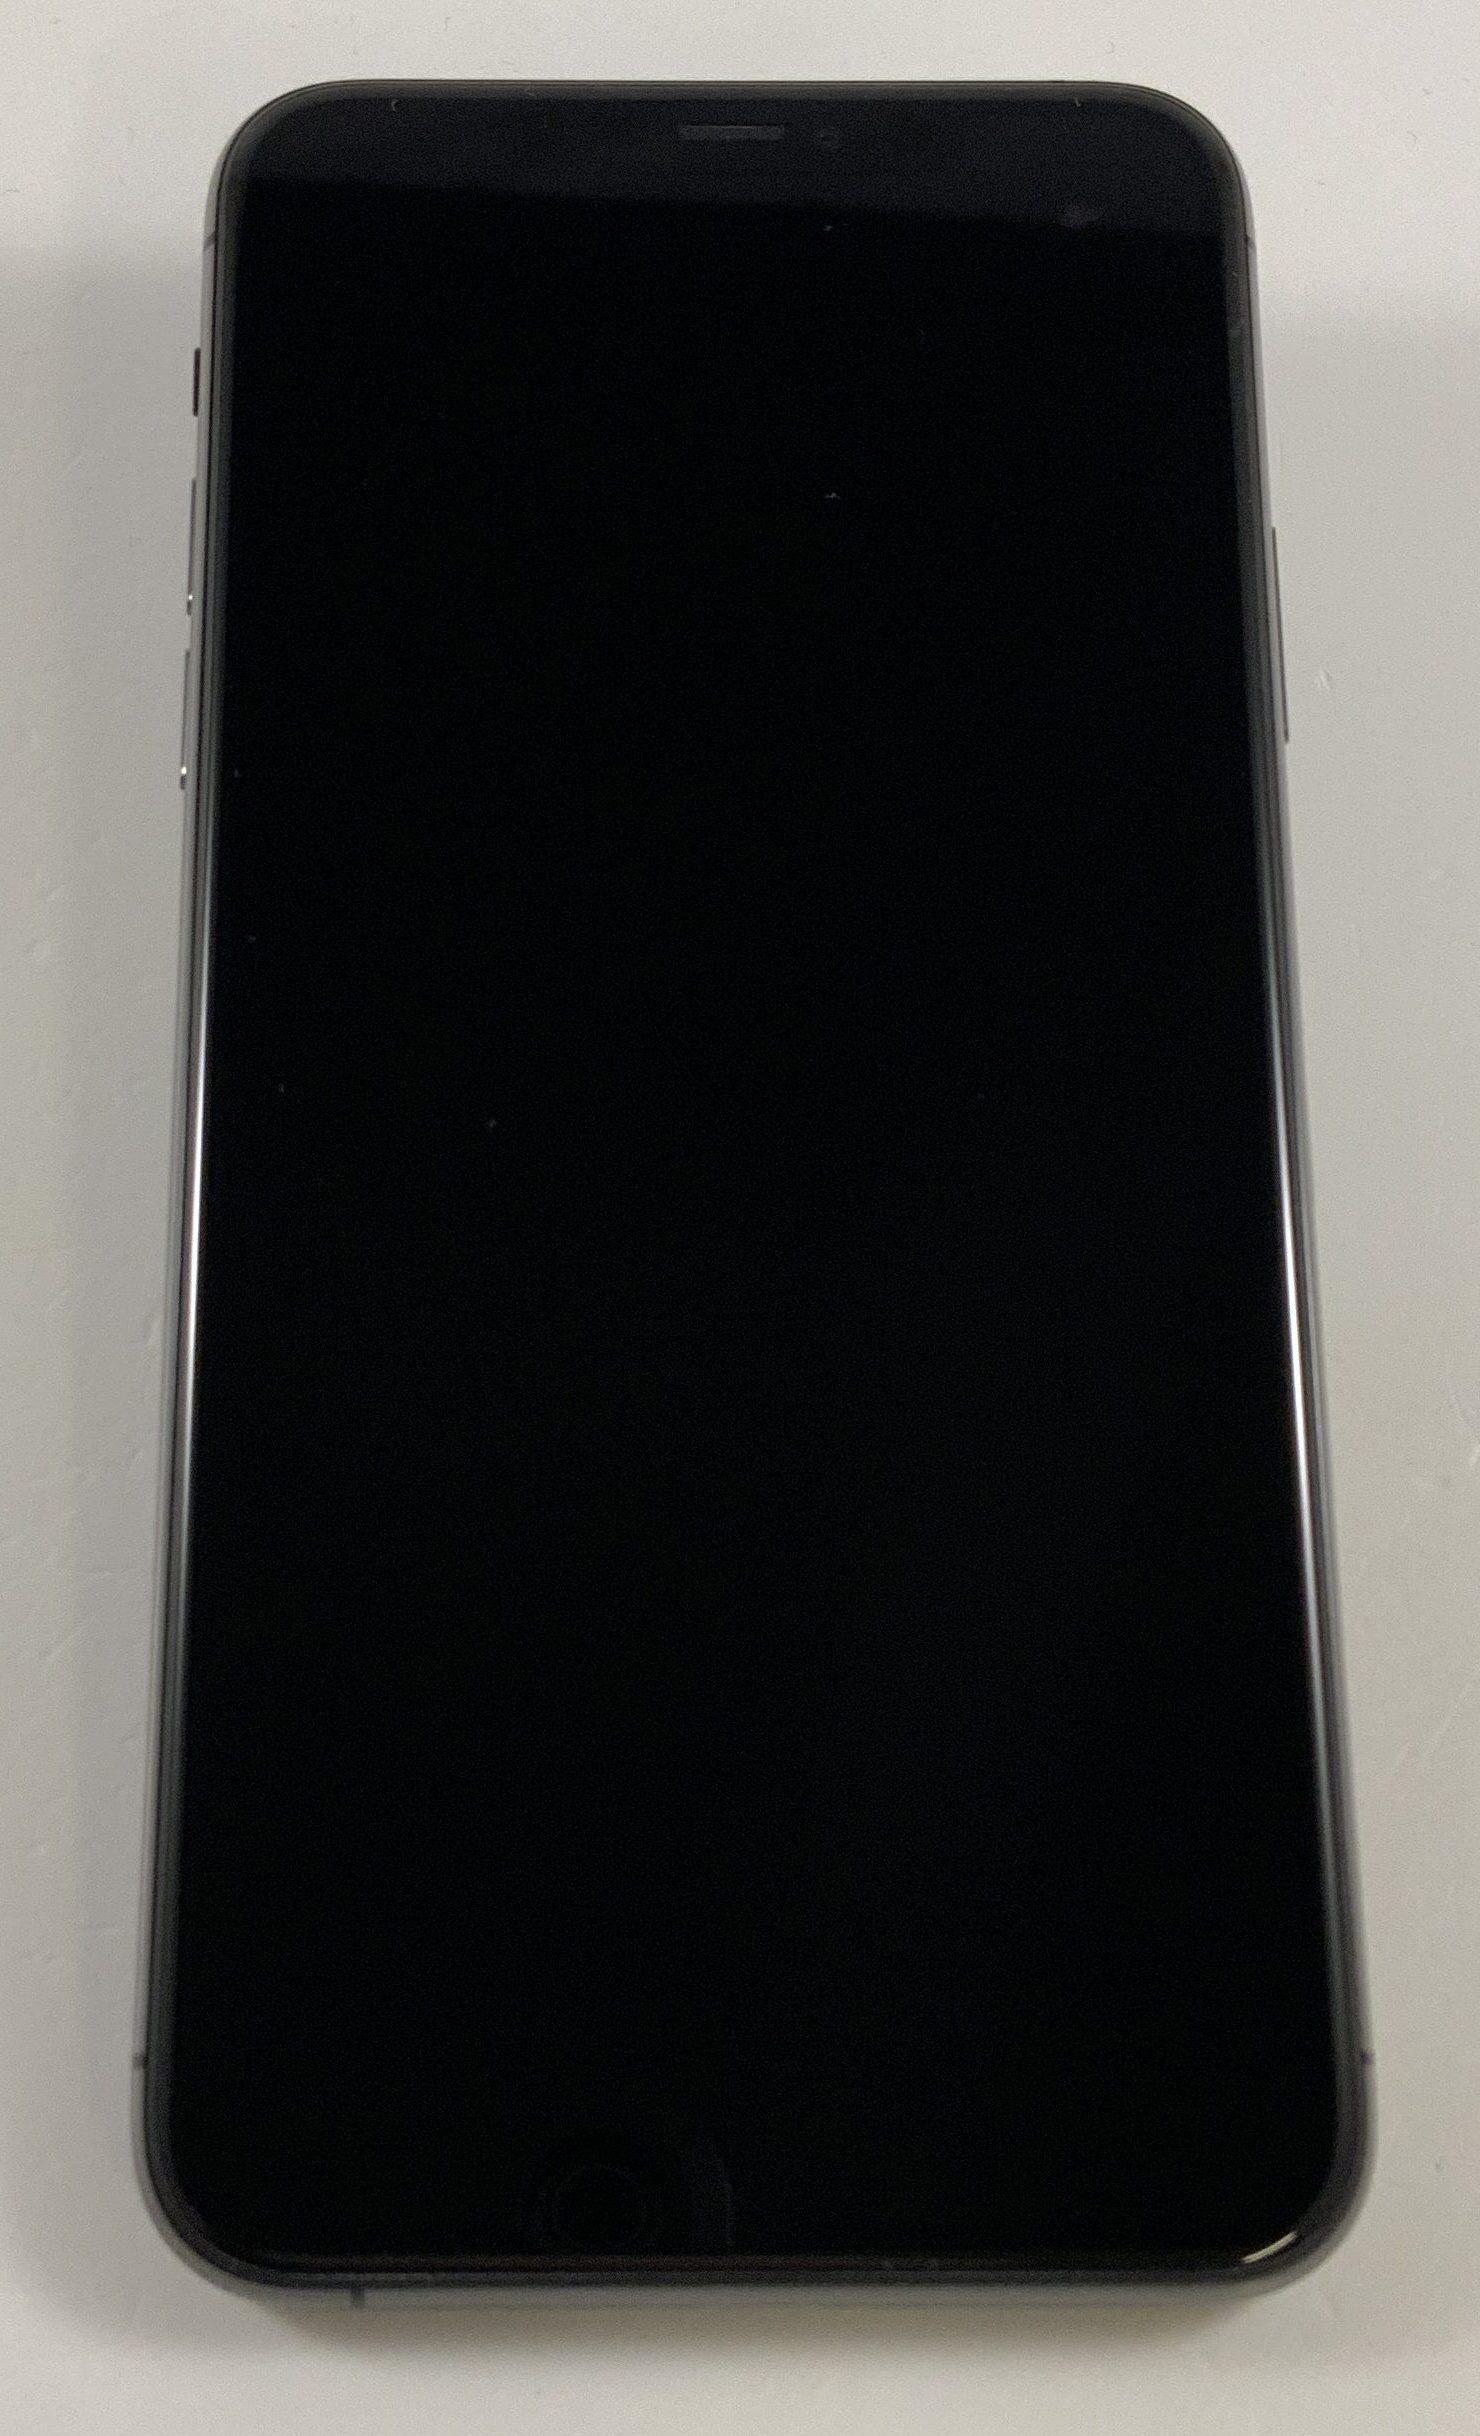 iPhone 11 Pro 64GB, 64GB, Space Gray, image 1